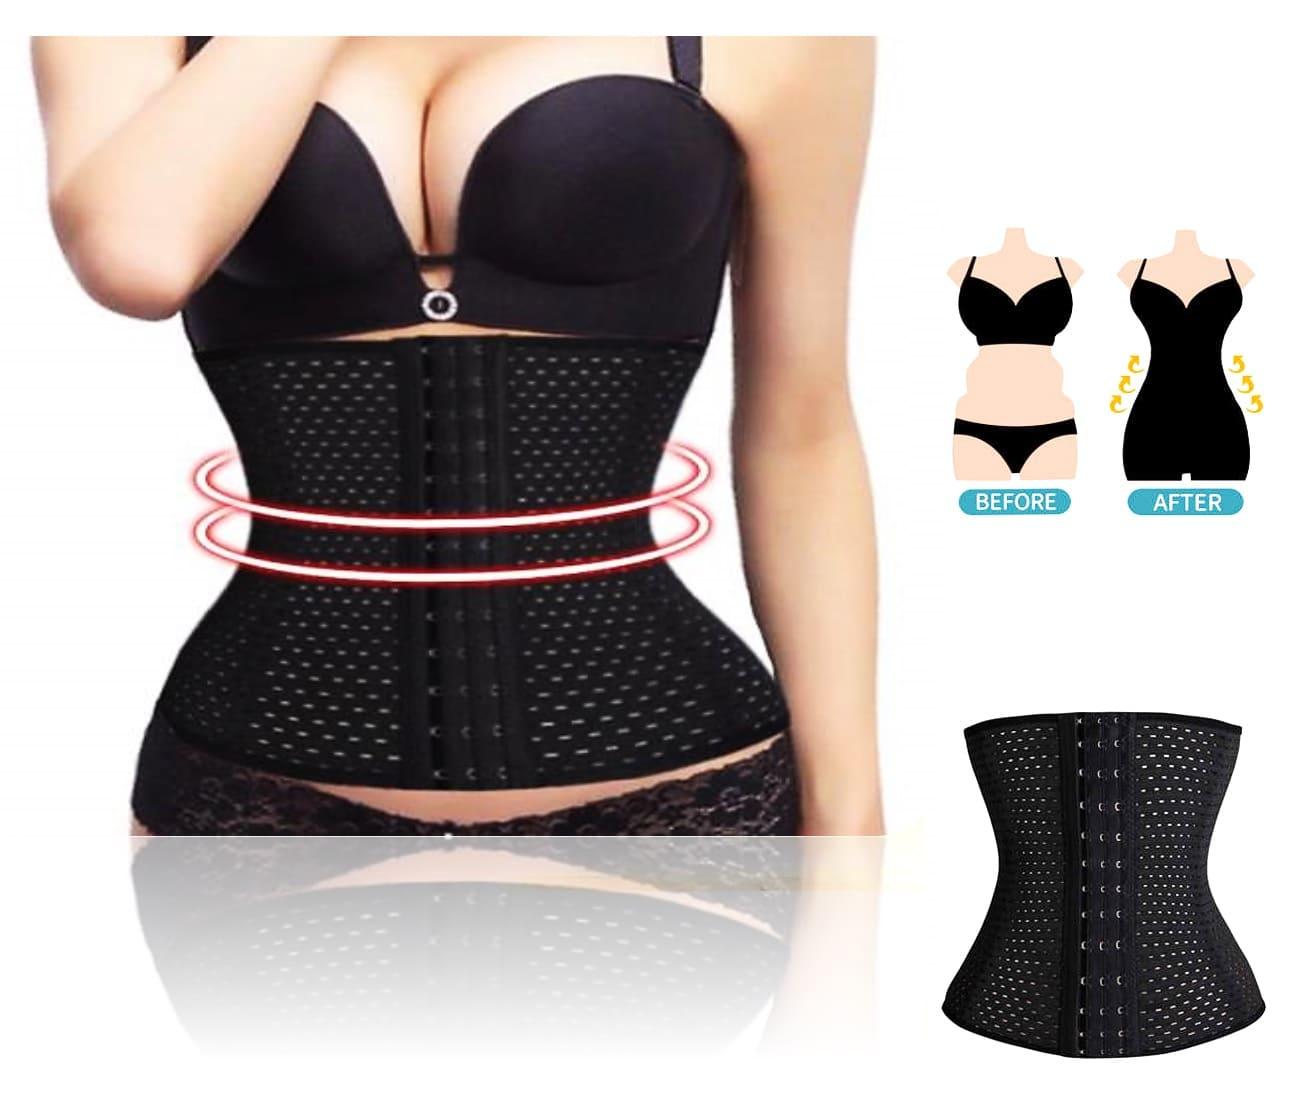 Faja reduce abdomen talla grande XXL corset varillas moldea cintura